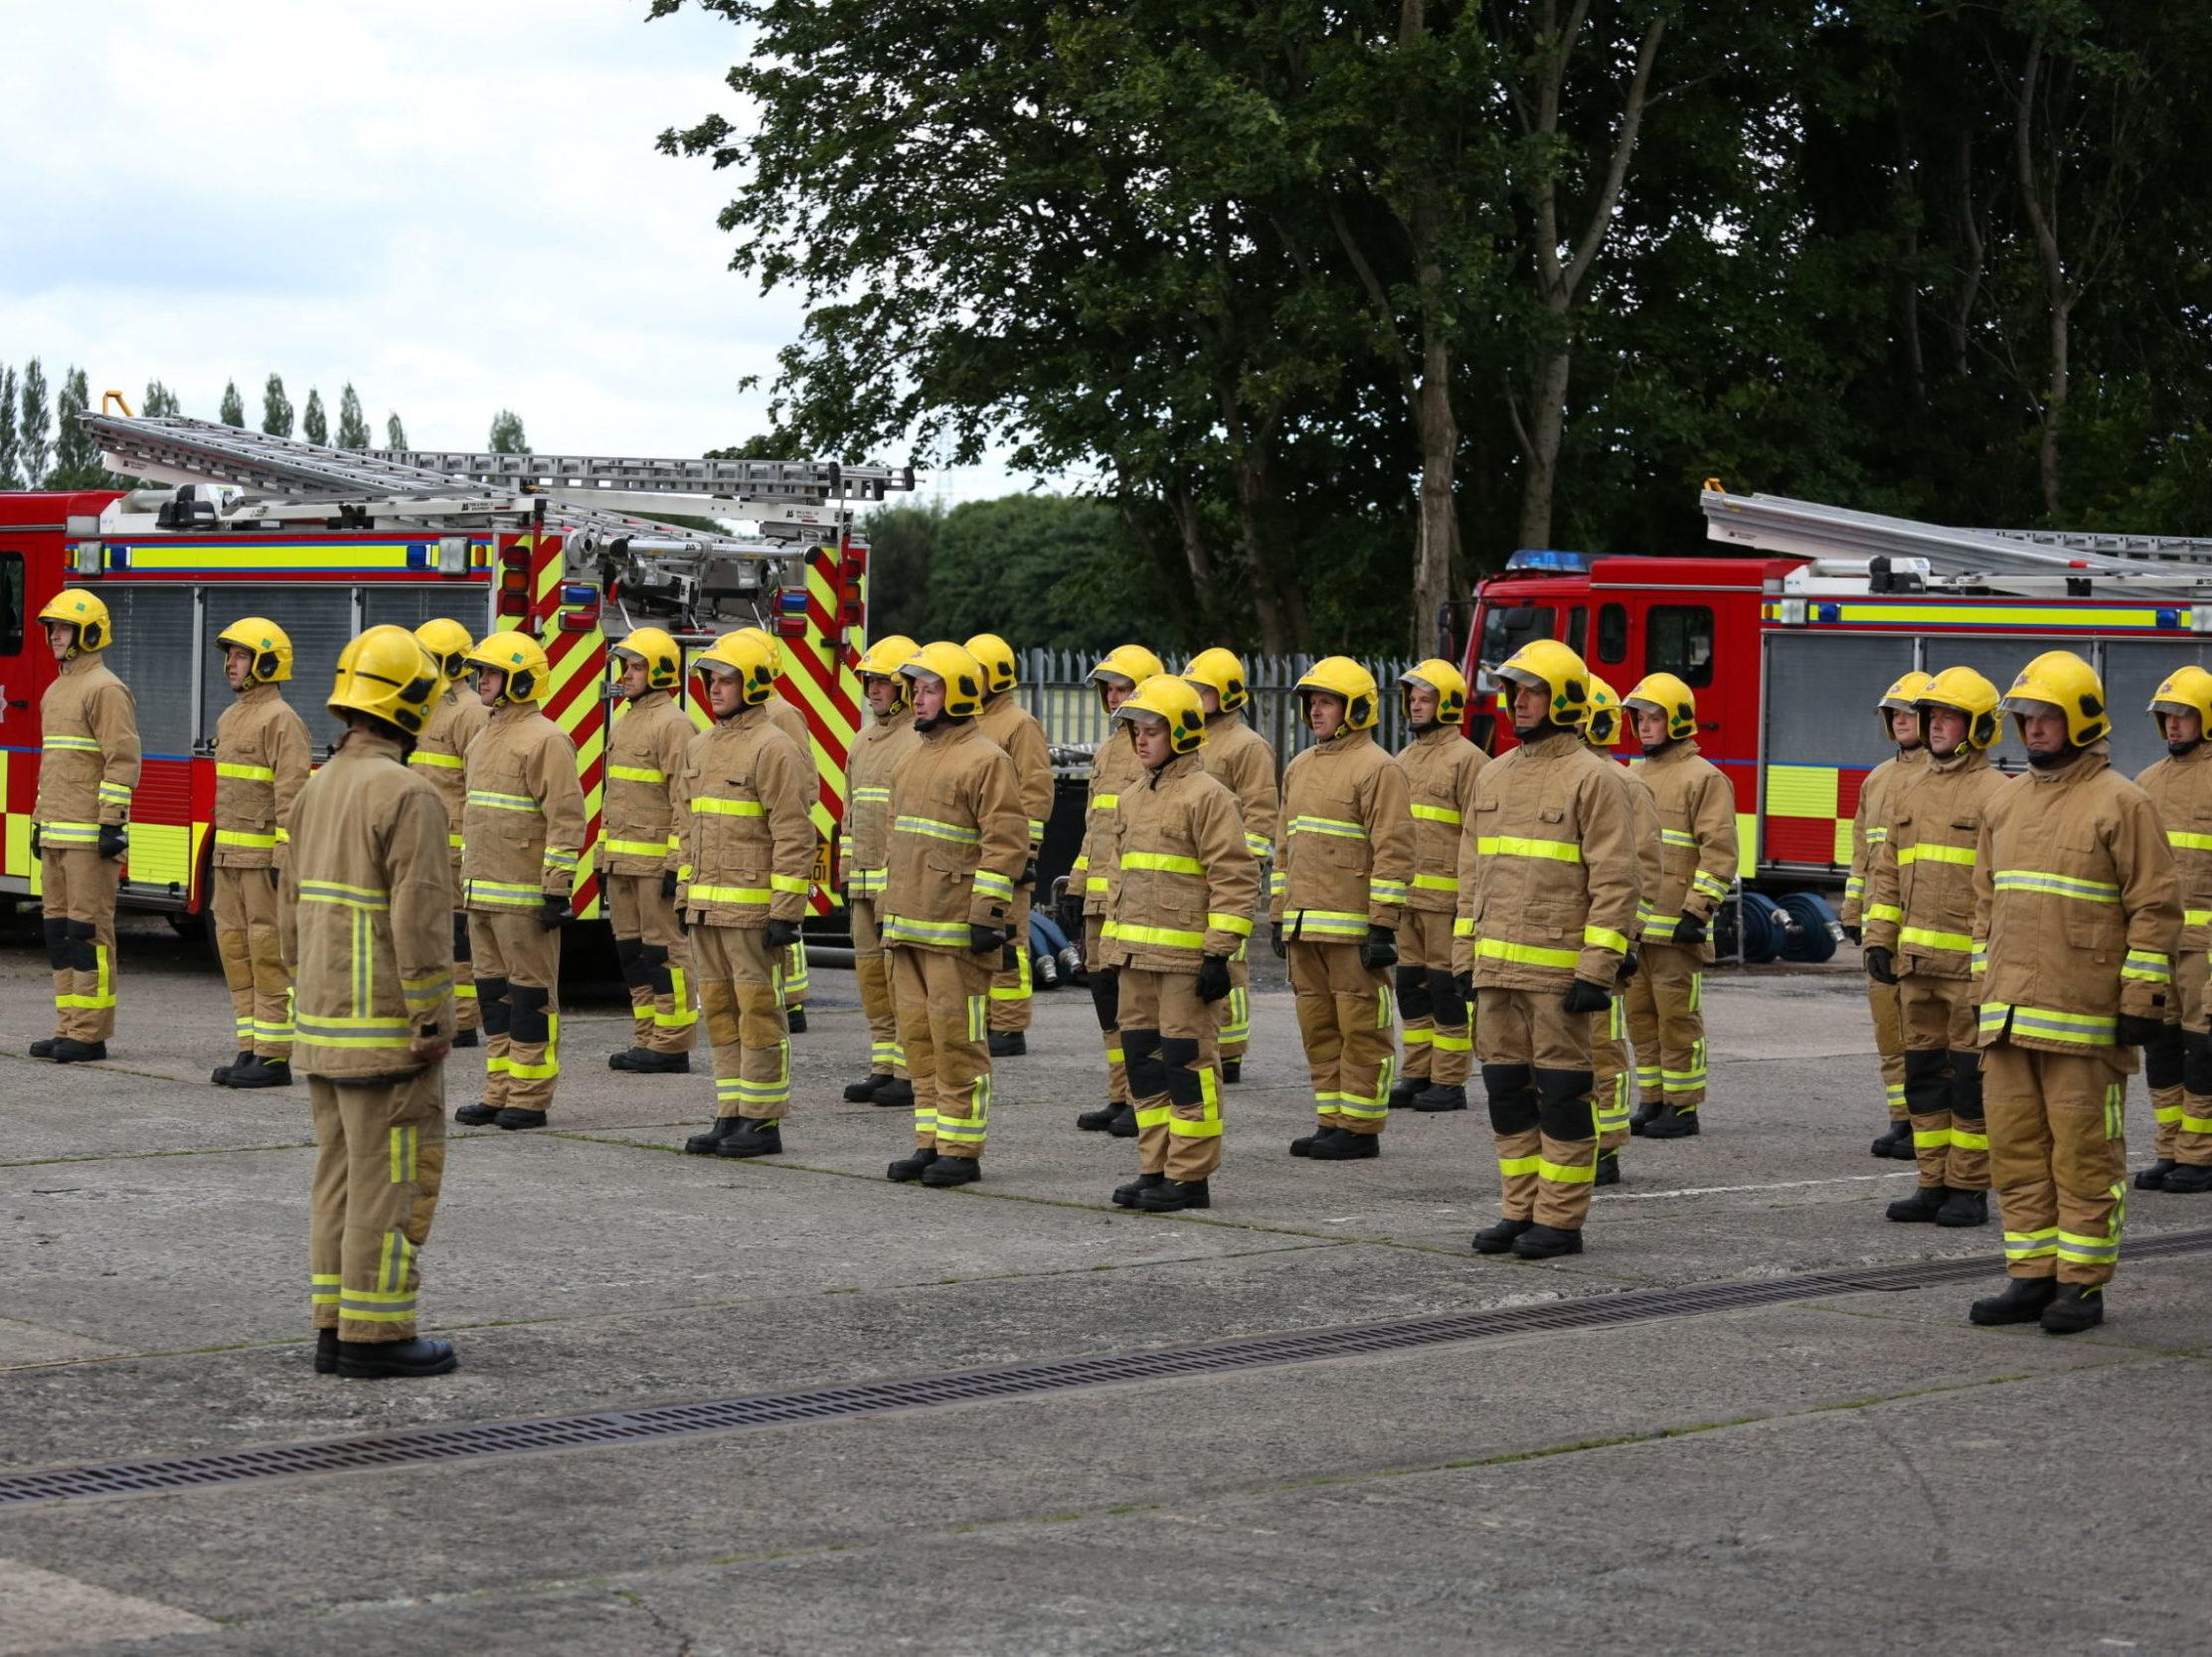 Trainee Firefighters.